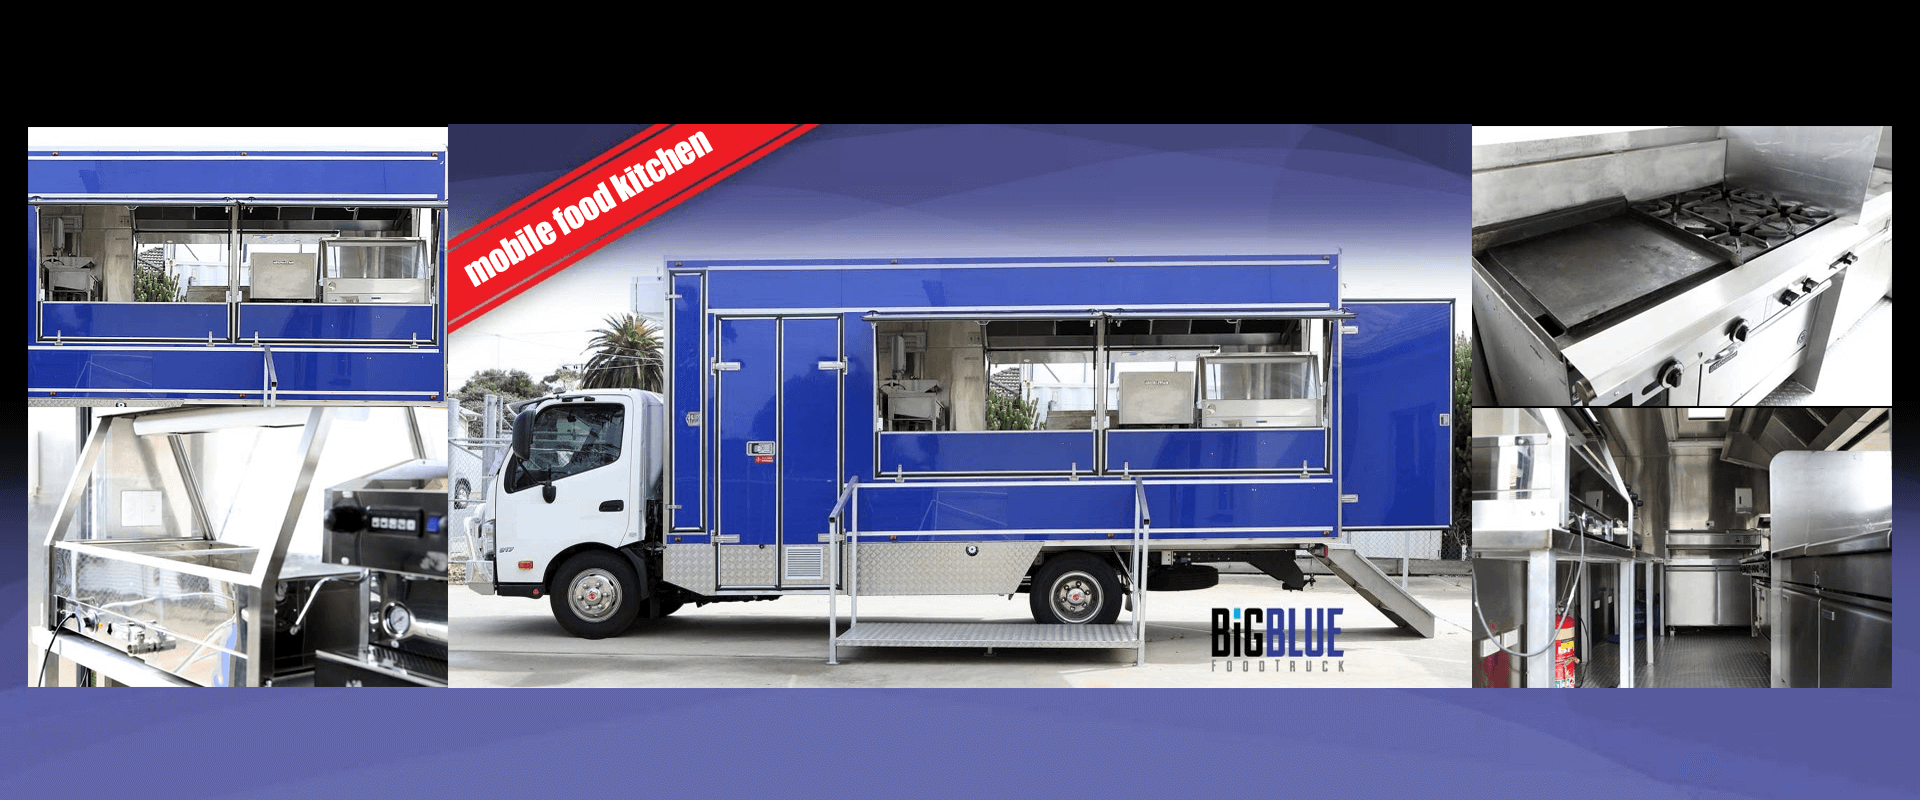 Squid Inc. International - Mobile Food Truck